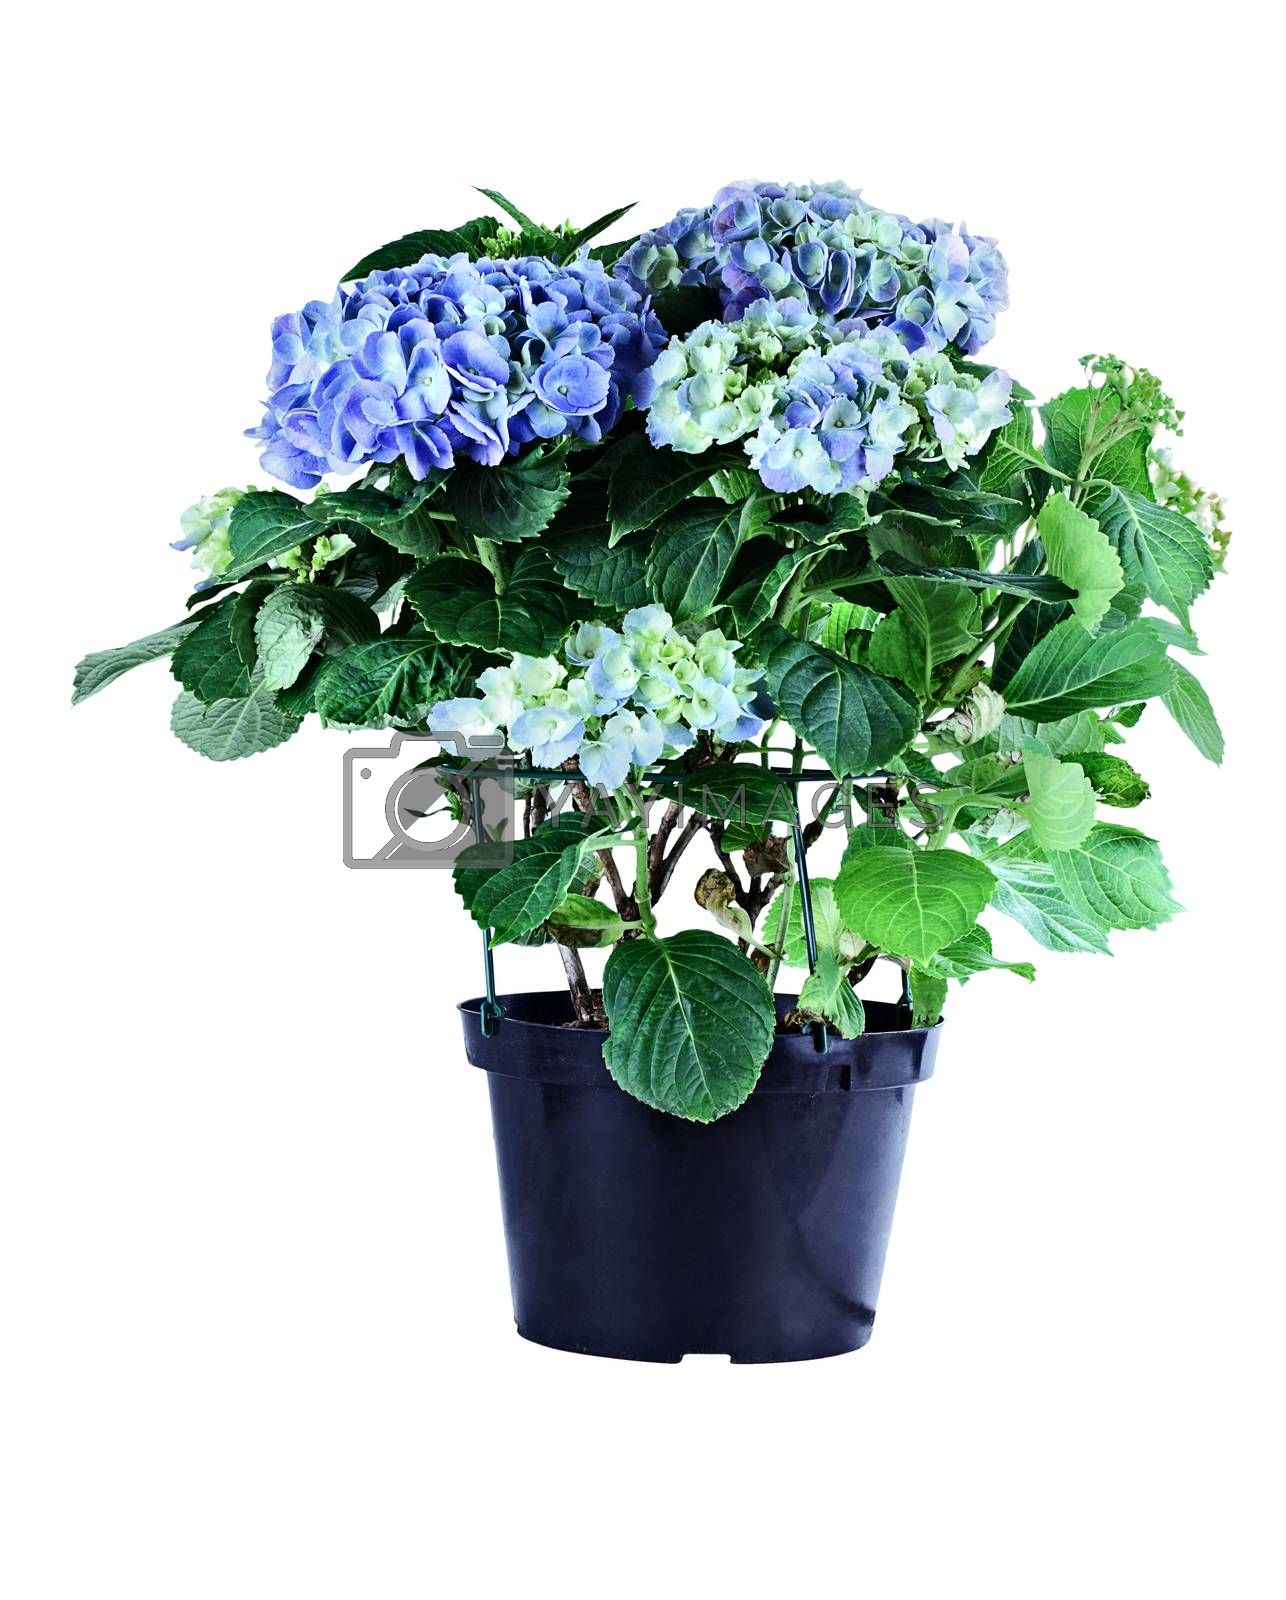 Royalty free image of Blue Hydrangea by StephanieFrey